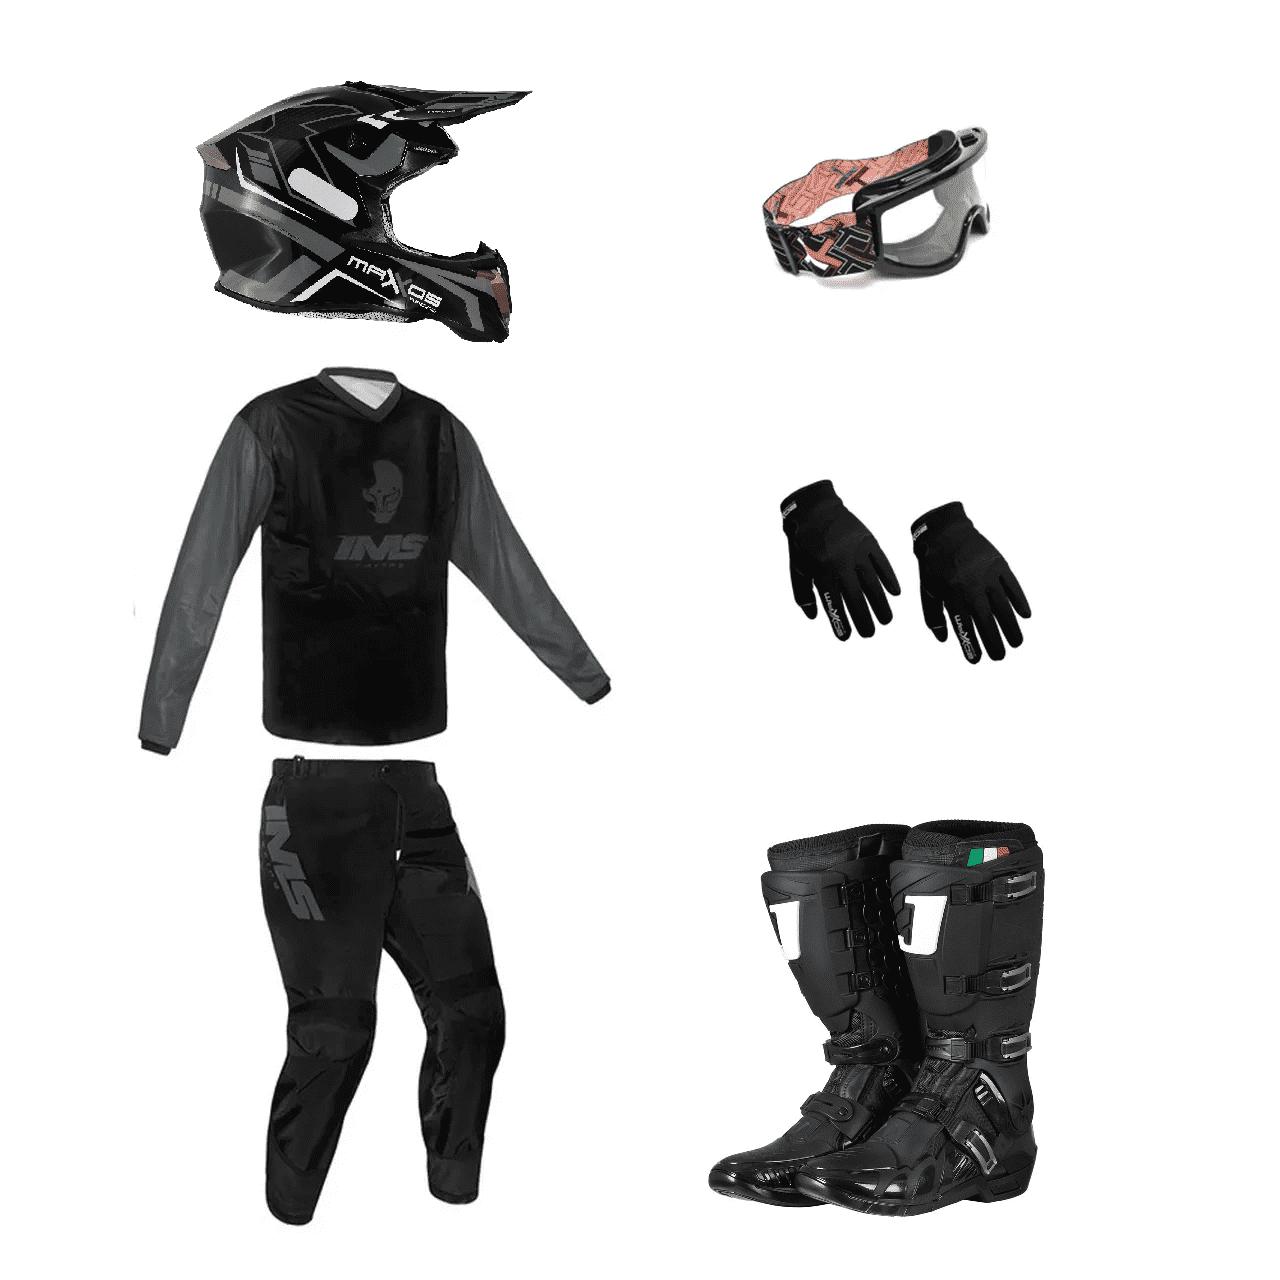 Kit Equipamento Trilha Motocross Enduro Basic 1- Preto